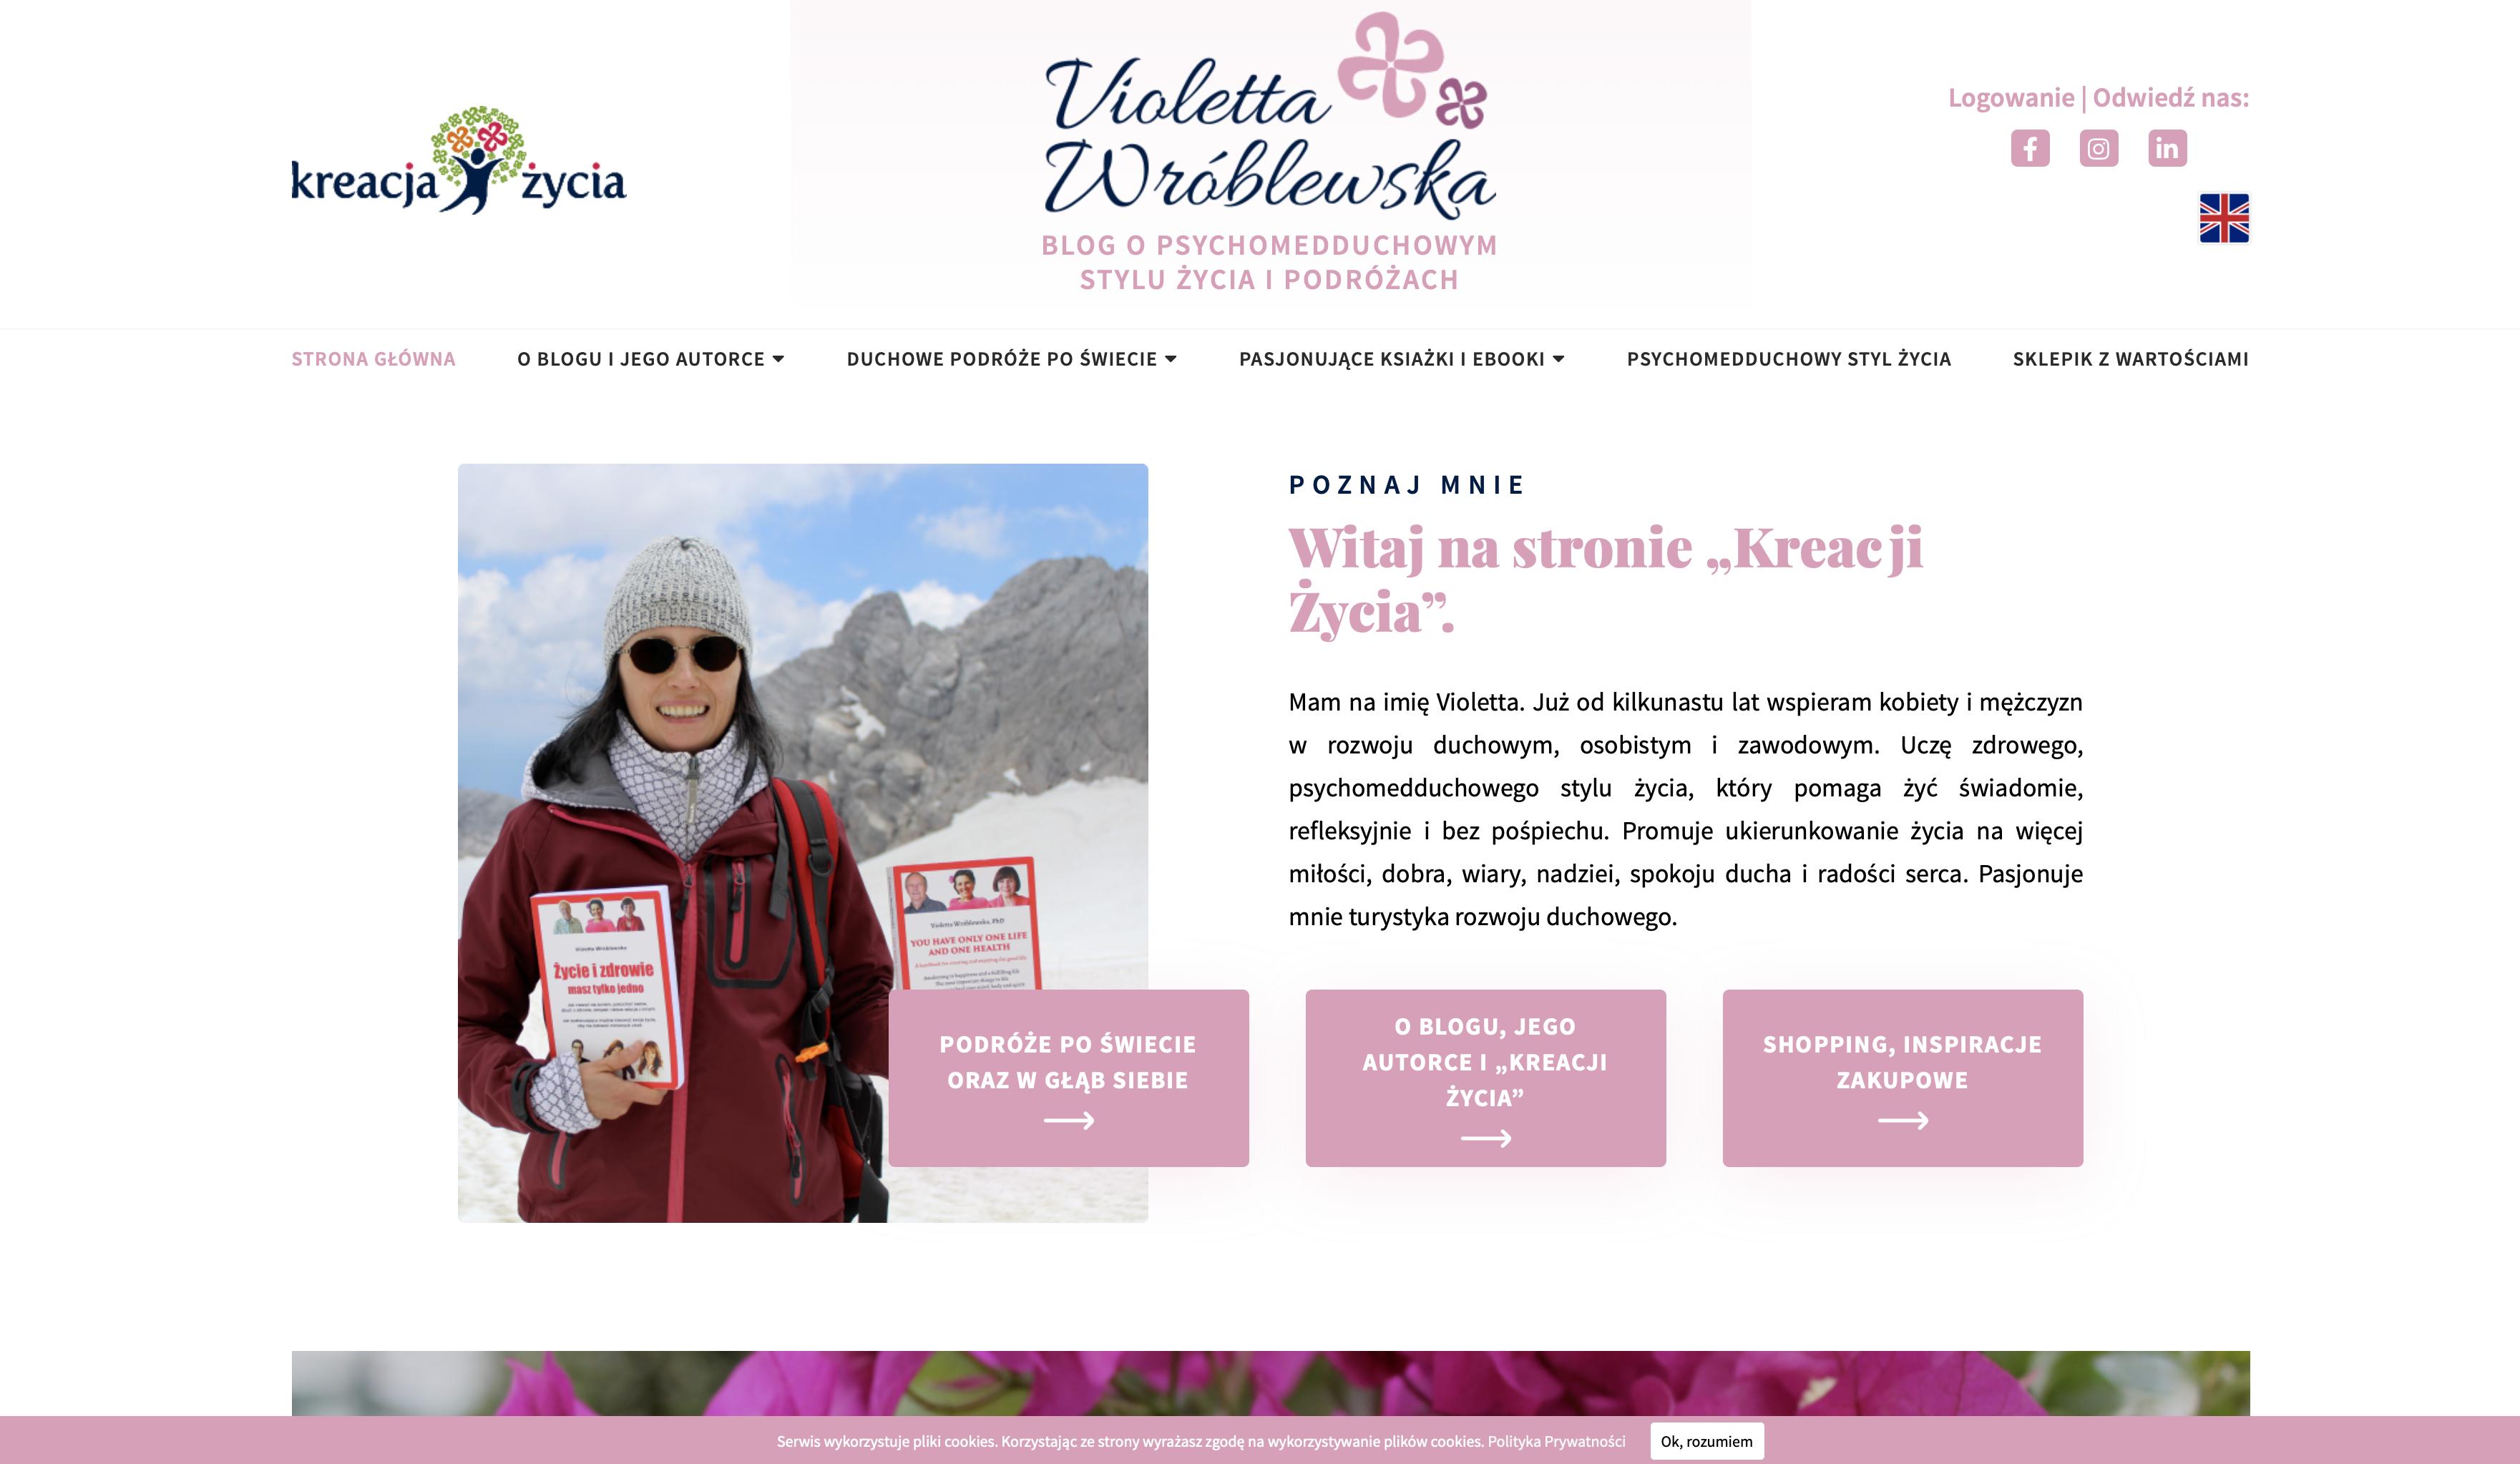 strona internetowa violettawroblewska.com